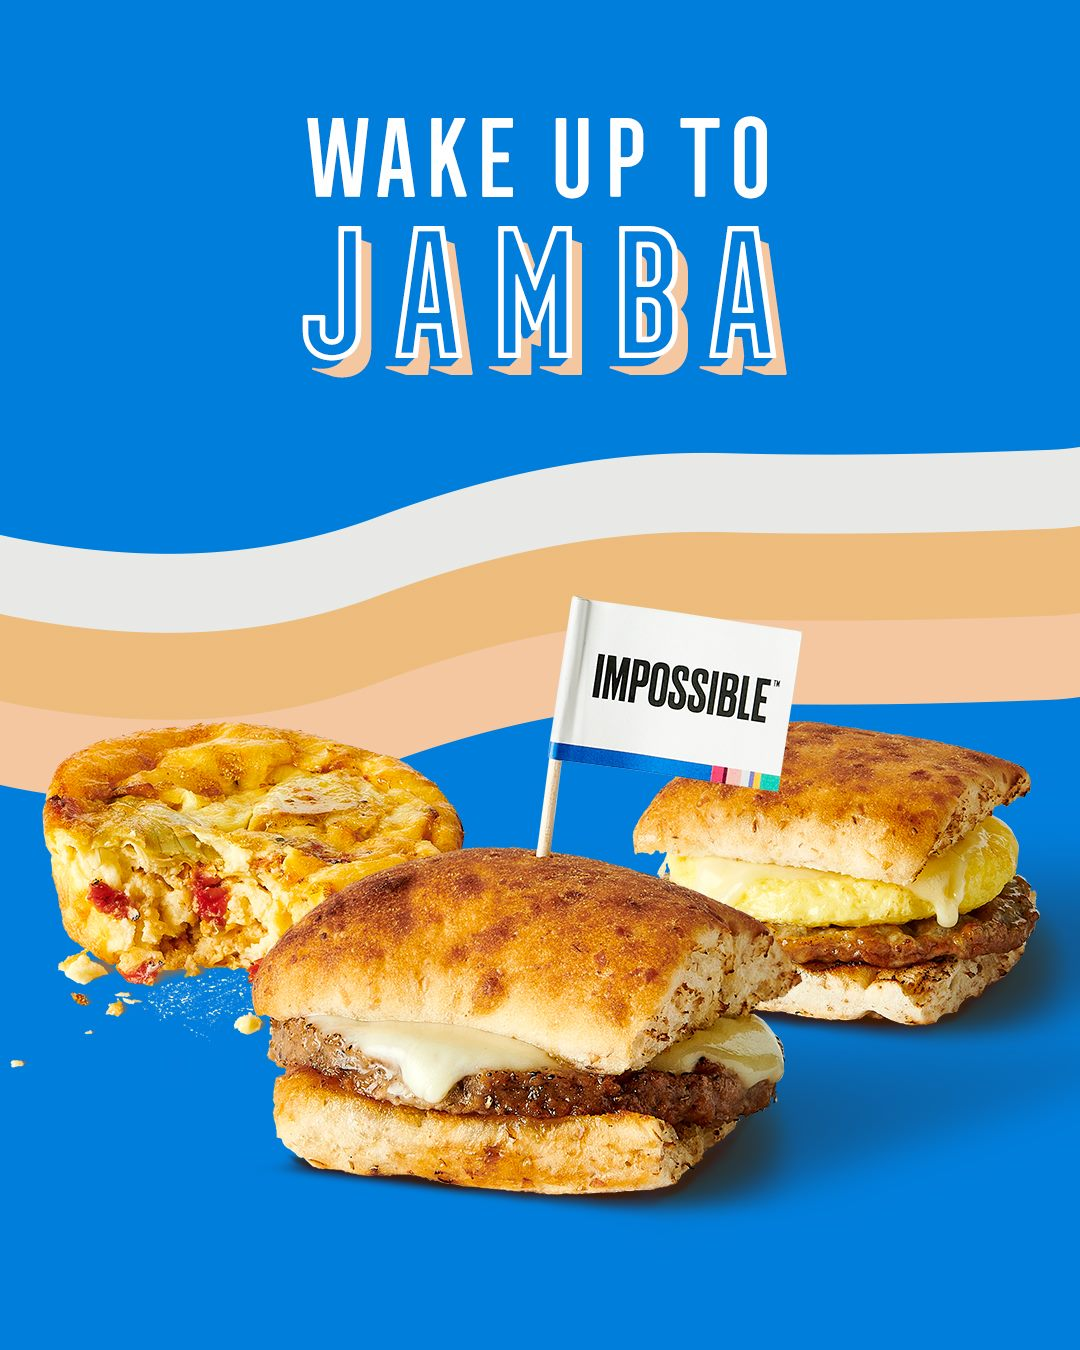 New Breakfast Lineup